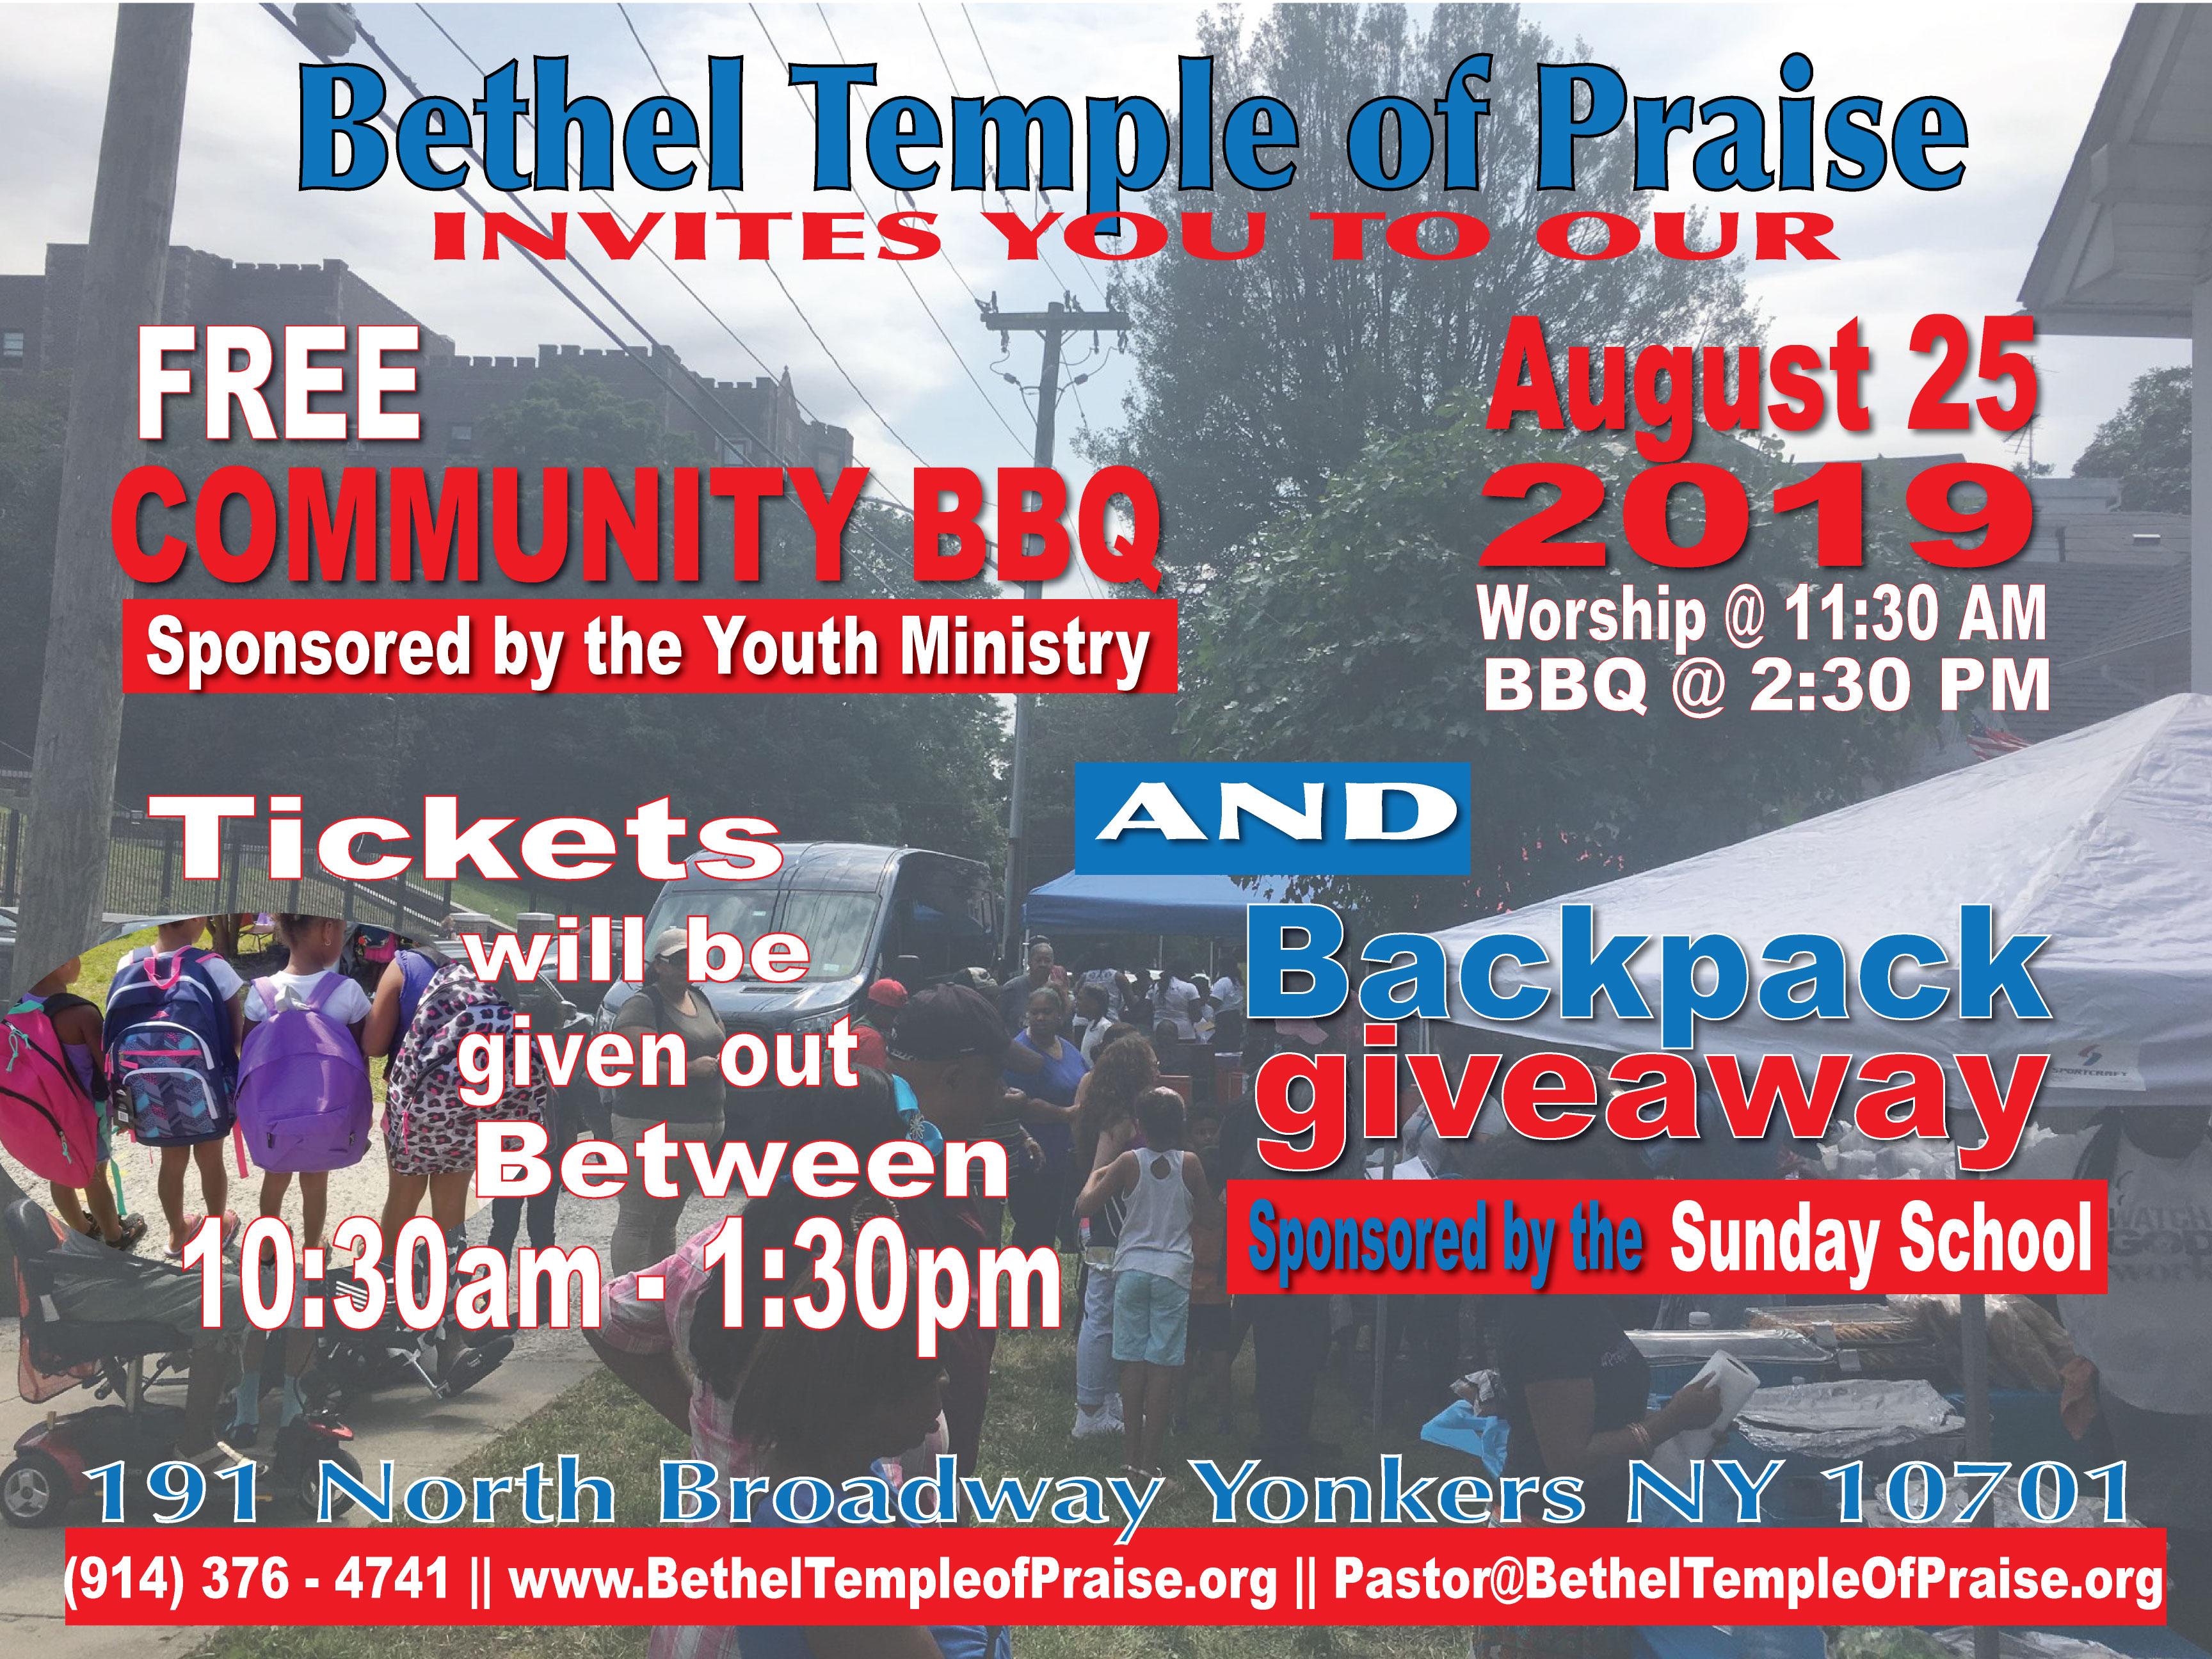 Annual Summer Community Outreach